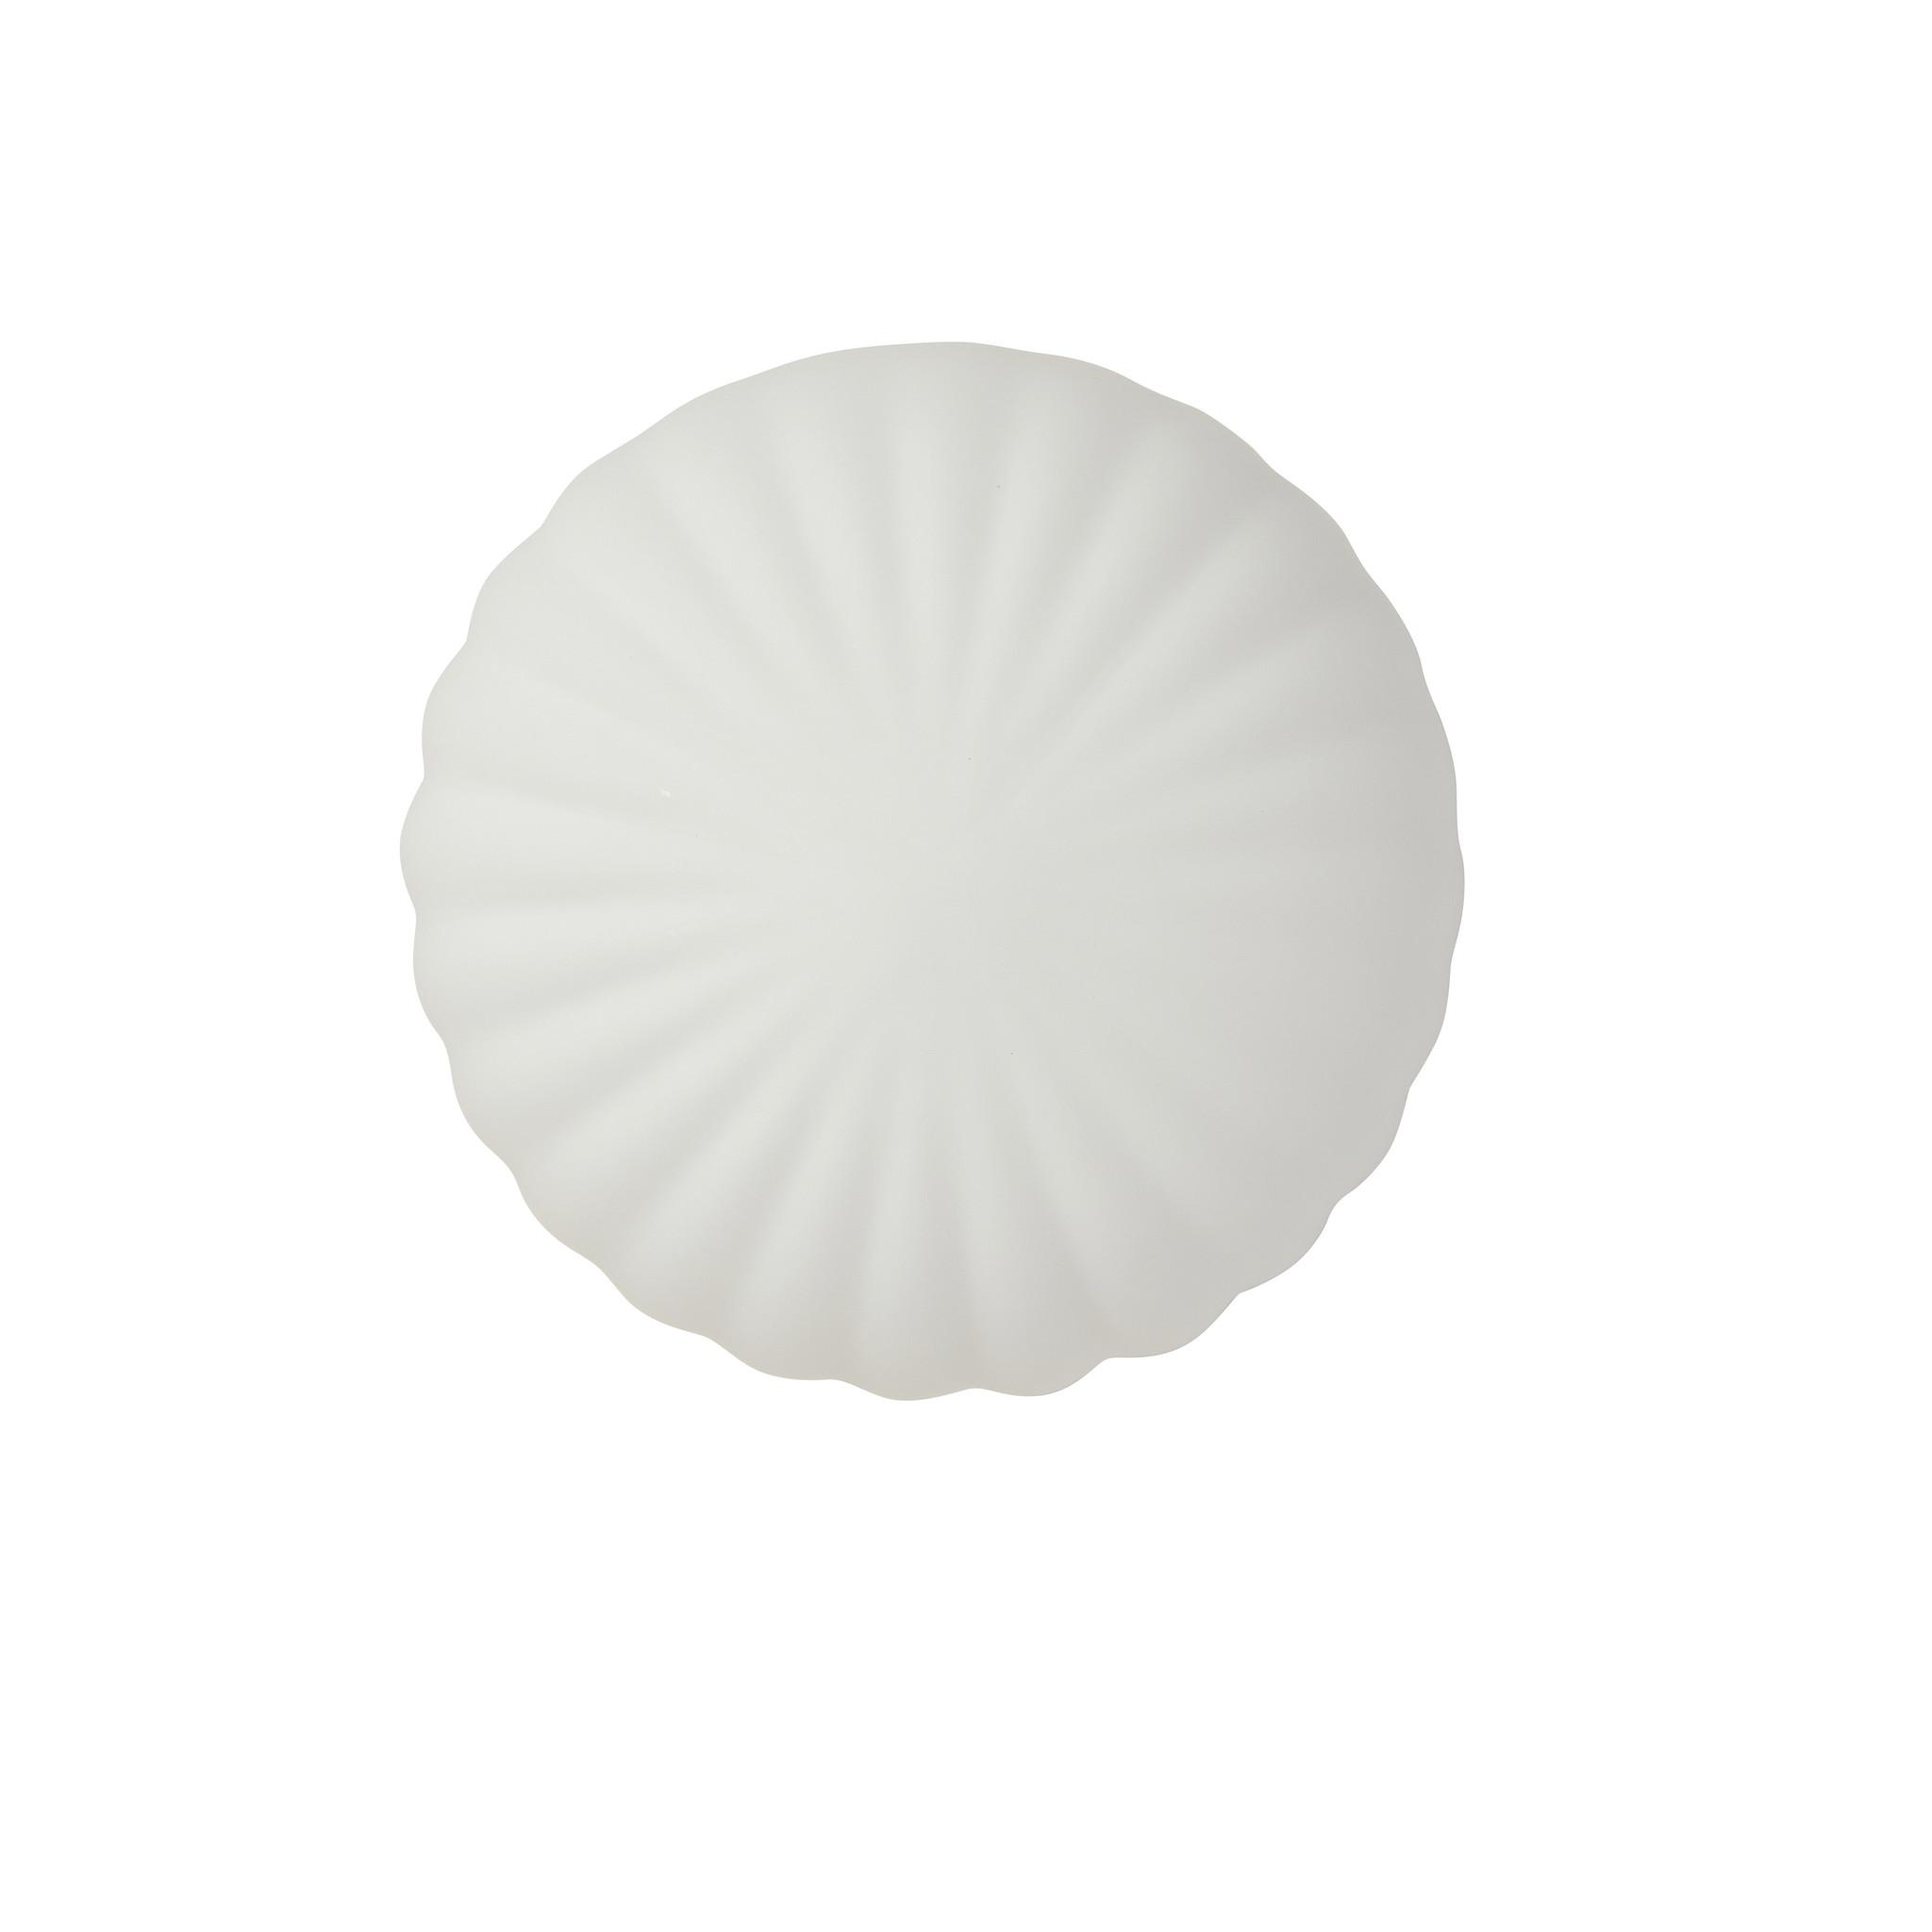 Hubsch Wandlamp metaal/glas, messing/opaal ø 18 cm